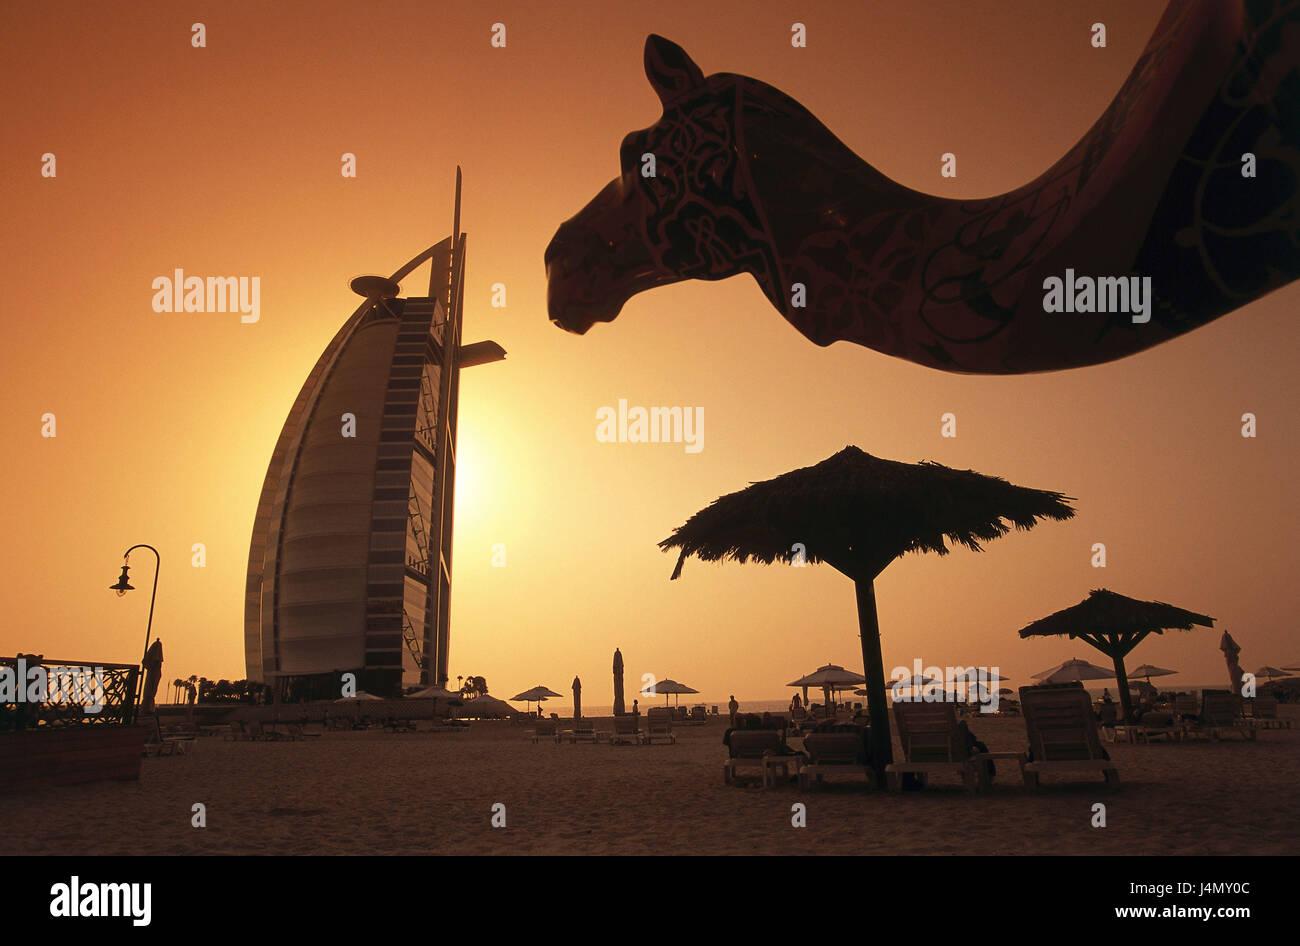 Vereinigte Arabische Emirate, Dubai, fünf-Sterne-Hotel Burj Al Arab, Palmen, Strand, Kamel, Sonnenuntergang Front Stockfoto